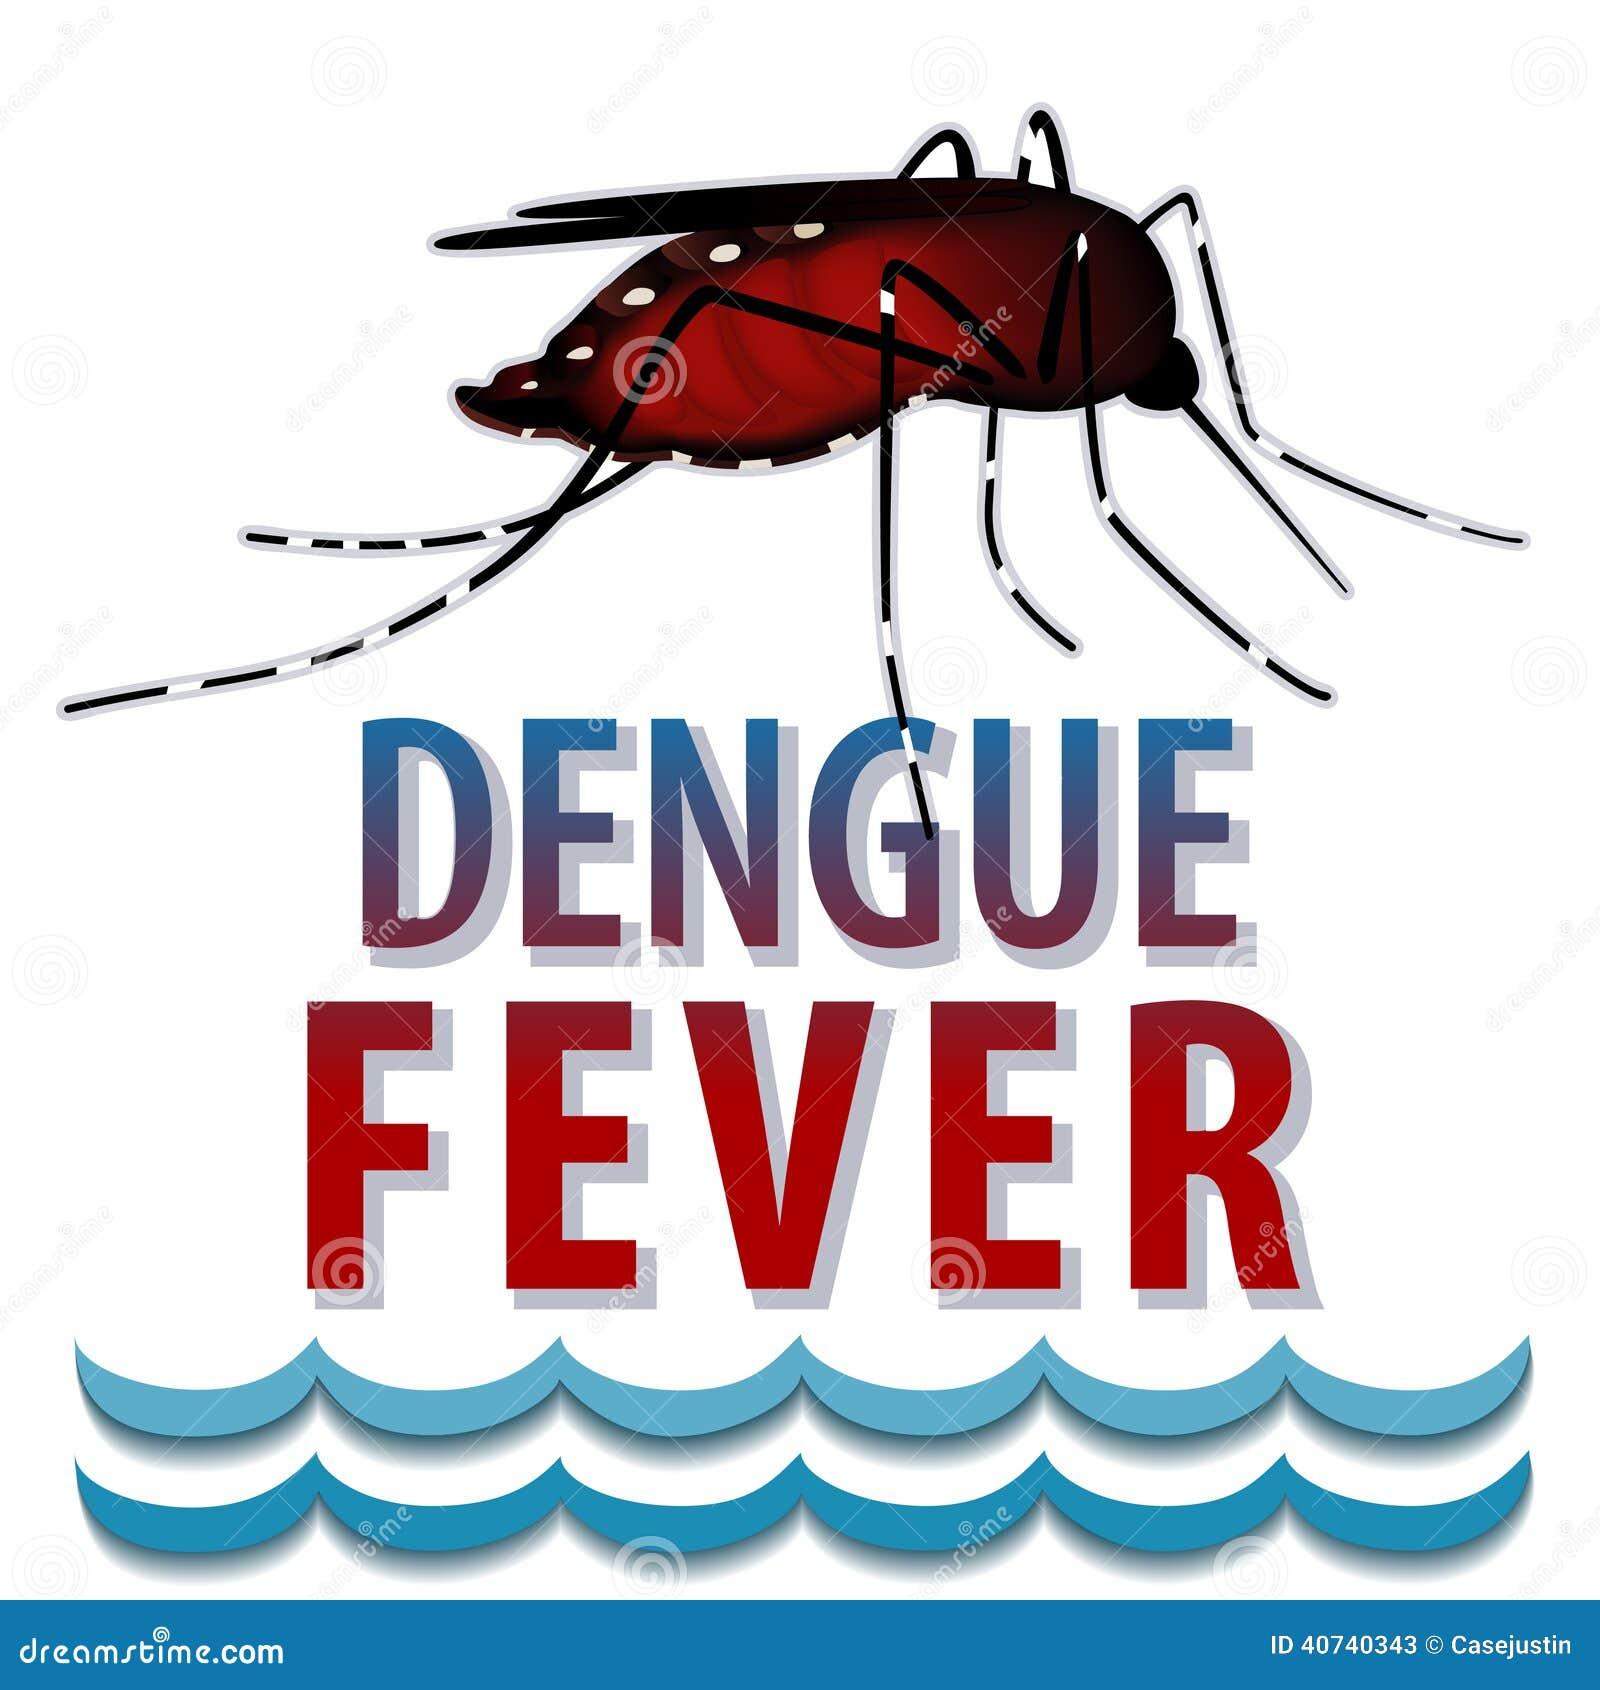 Dengue mosquito clipart - photo#17